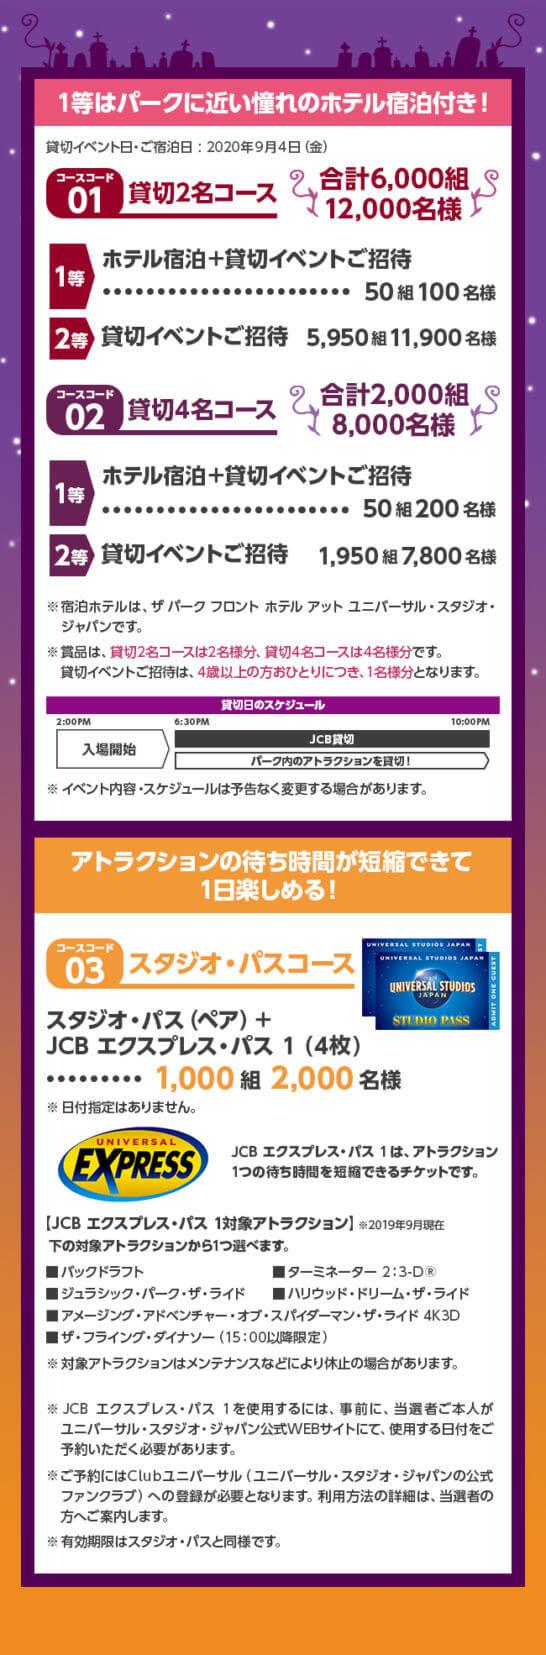 JCBのユニバーサル・スタジオ・ジャパン ハロウィーン貸切キャンペーン 2020の賞品